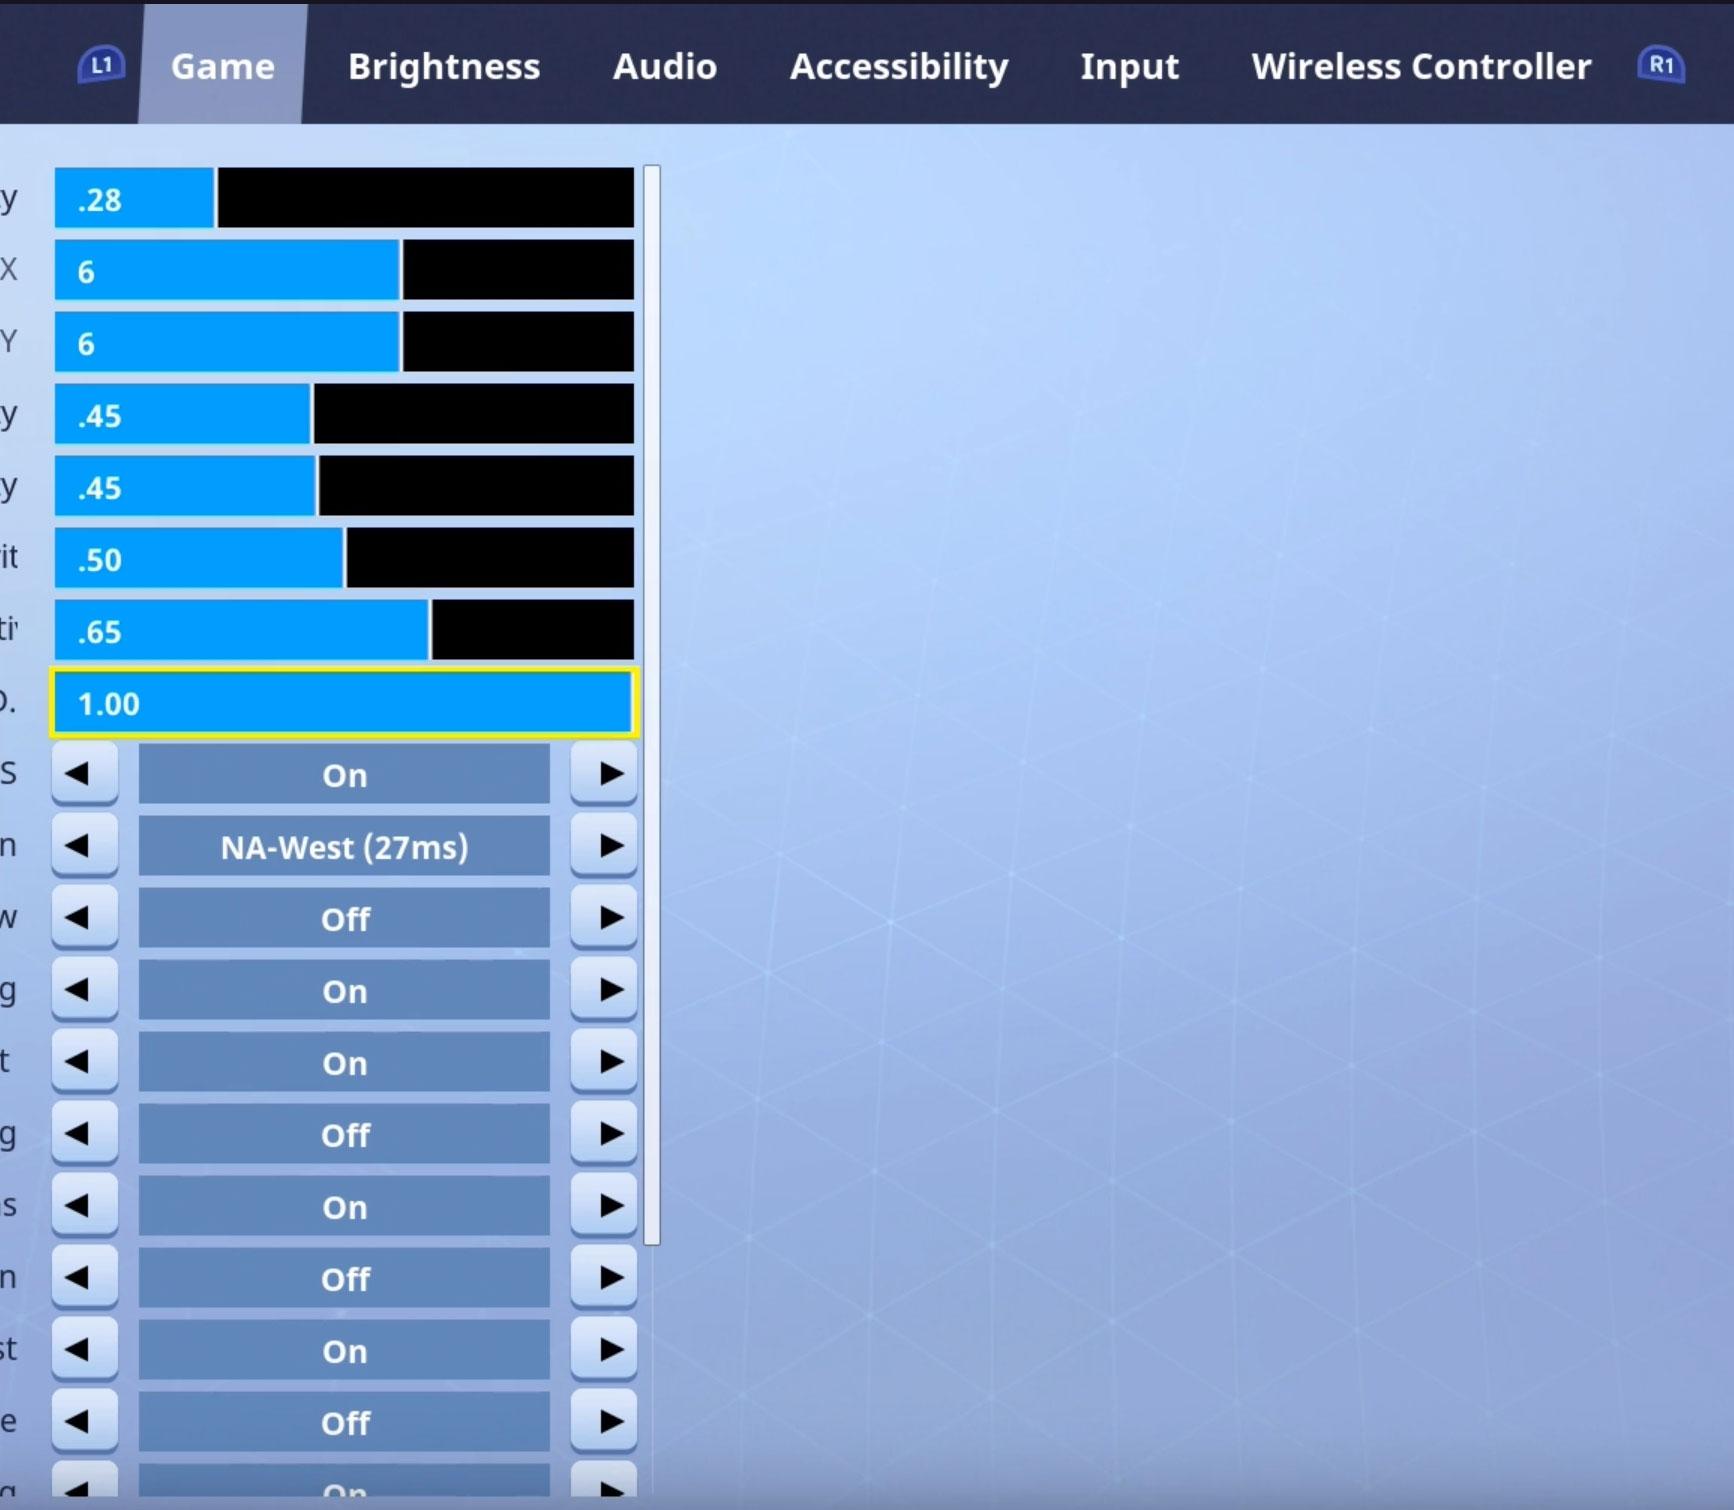 Nick Eh 30 Fortnite Settings Keybinds Updated February: NICKMERCS Fortnite Settings & Keybinds (Updated September